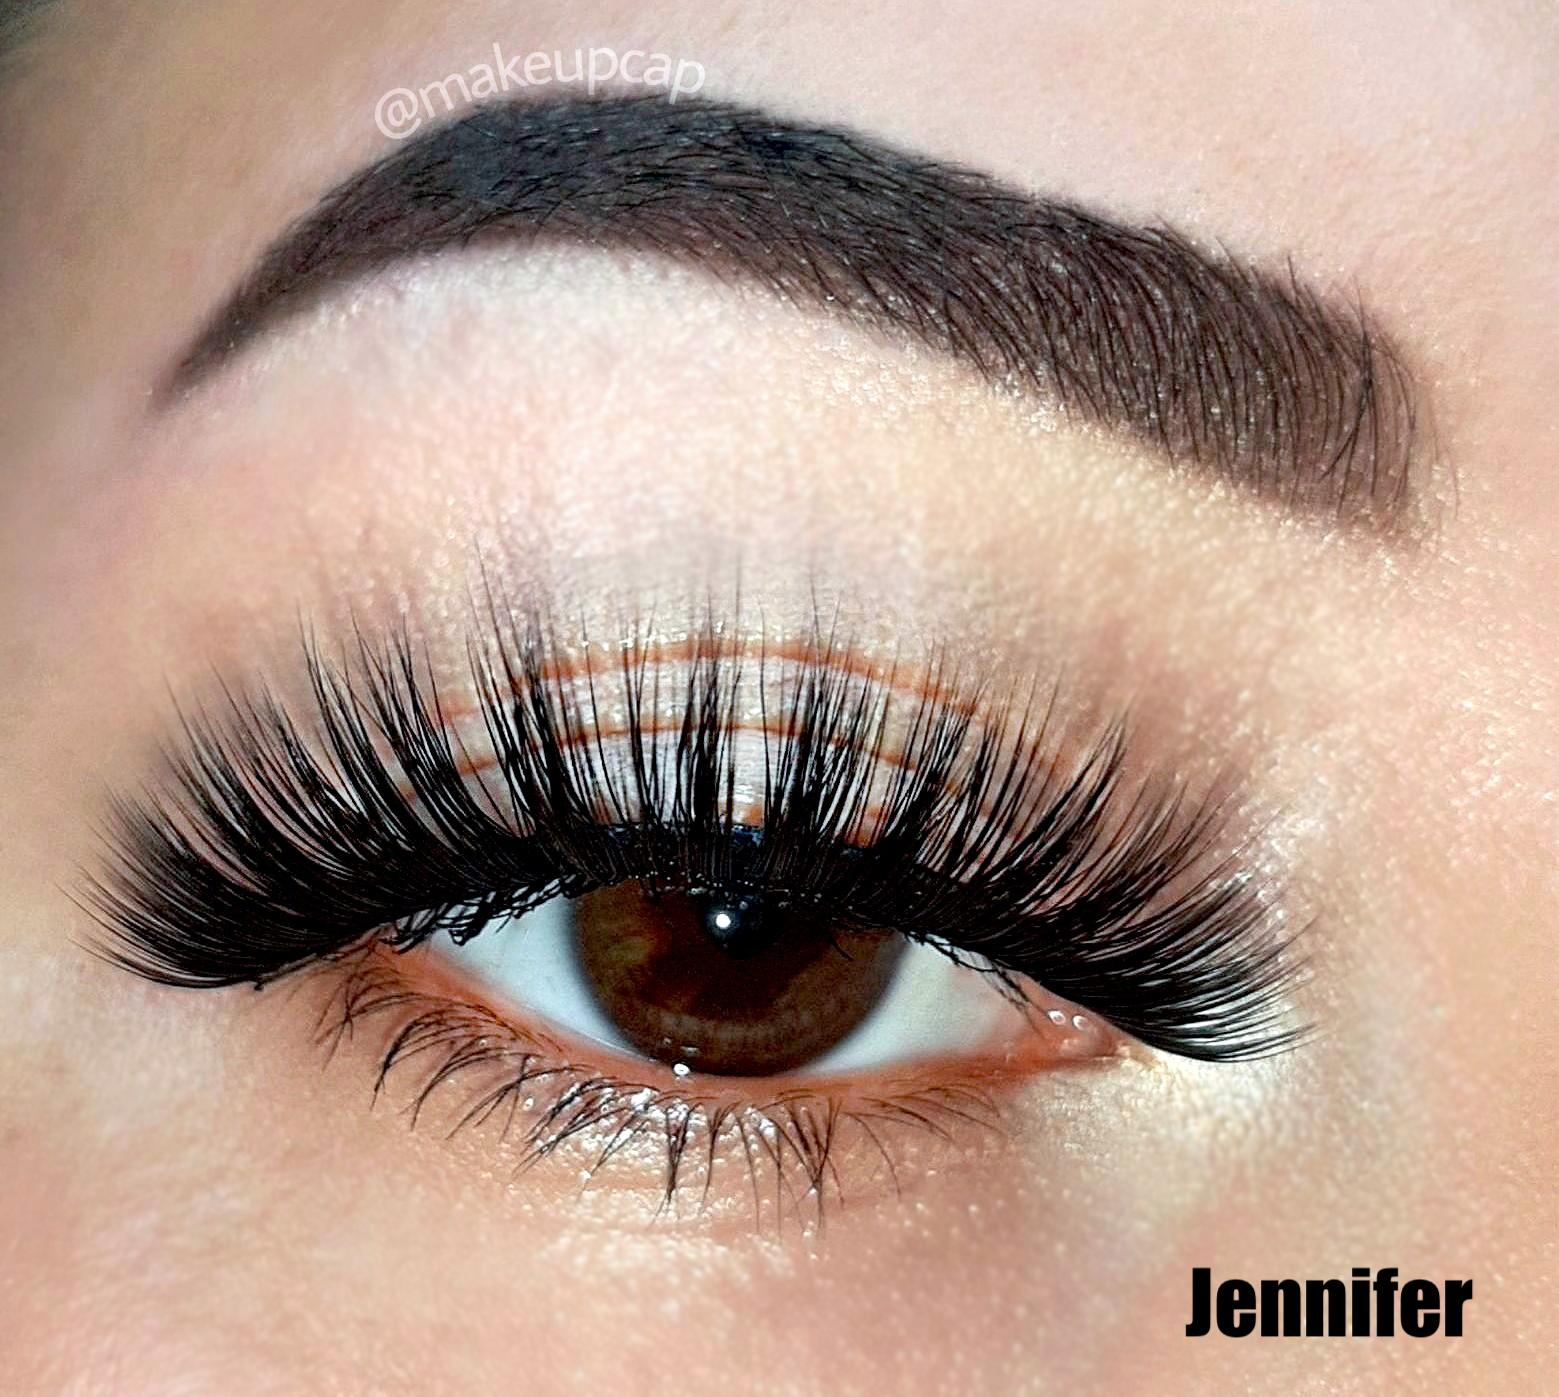 False Eyelashes That Look Natural - Jennifer